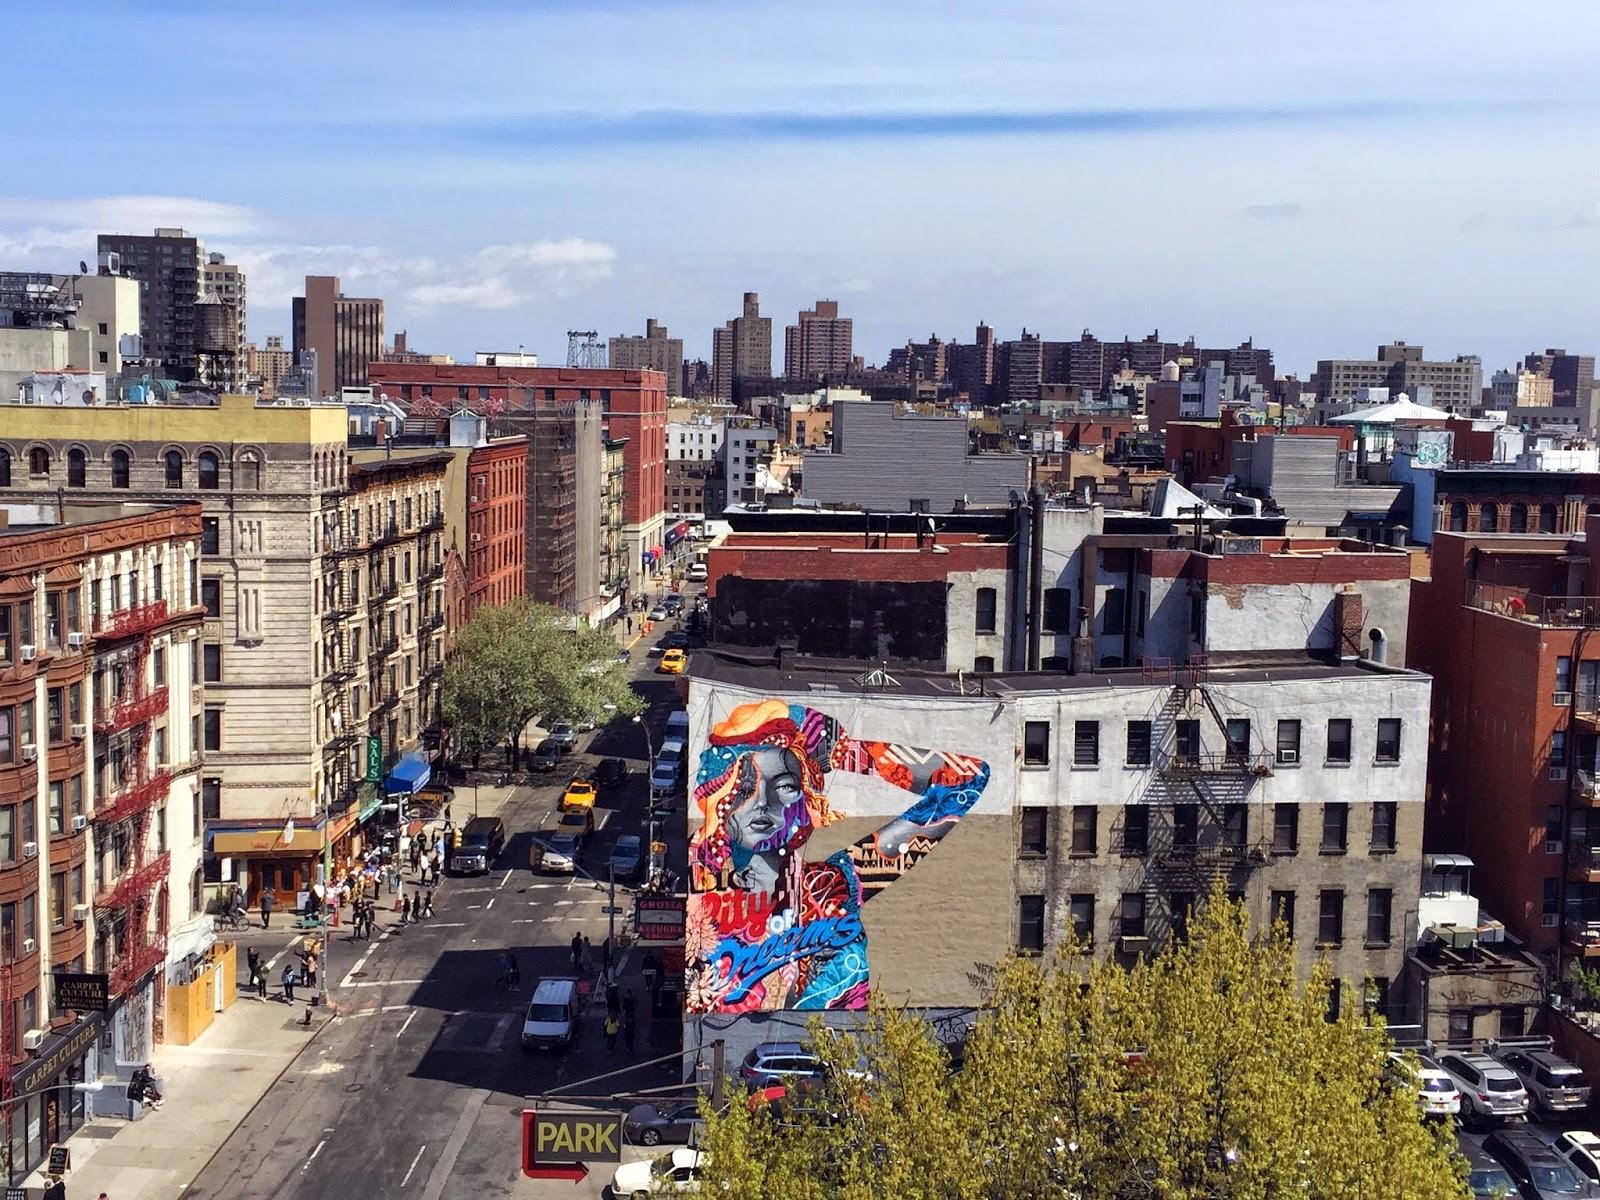 Oeuvre de Tristan Eaton à NYC, USA